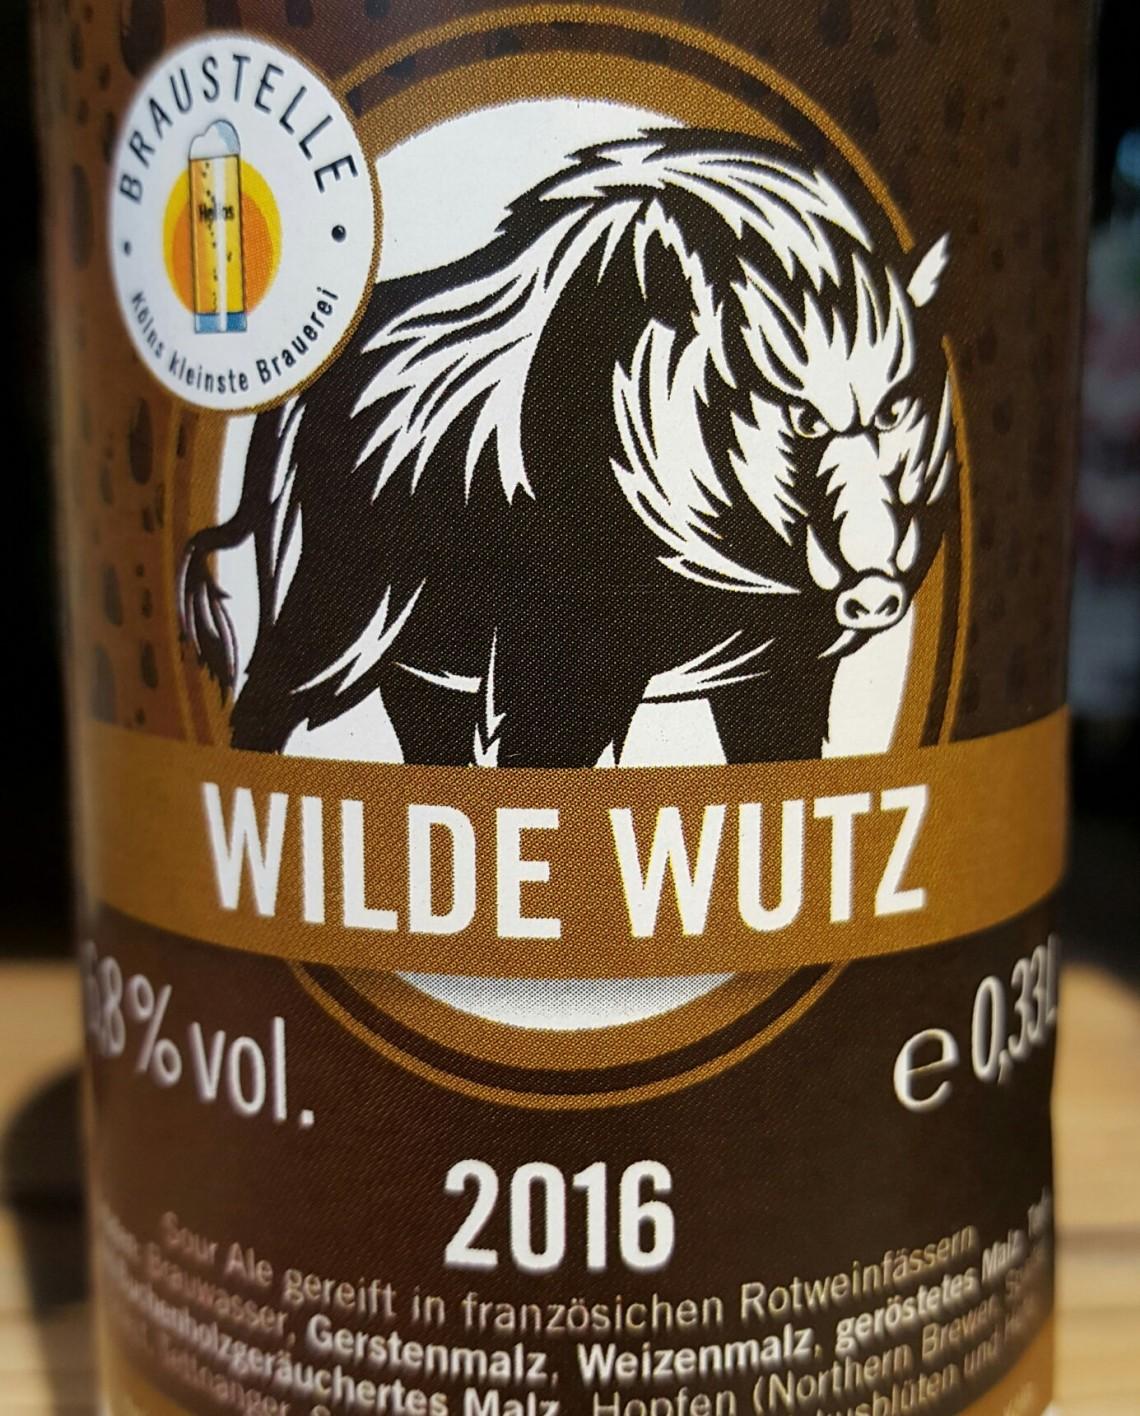 craftbeer-dealer.com_braustelle_wilde_wutz_2016